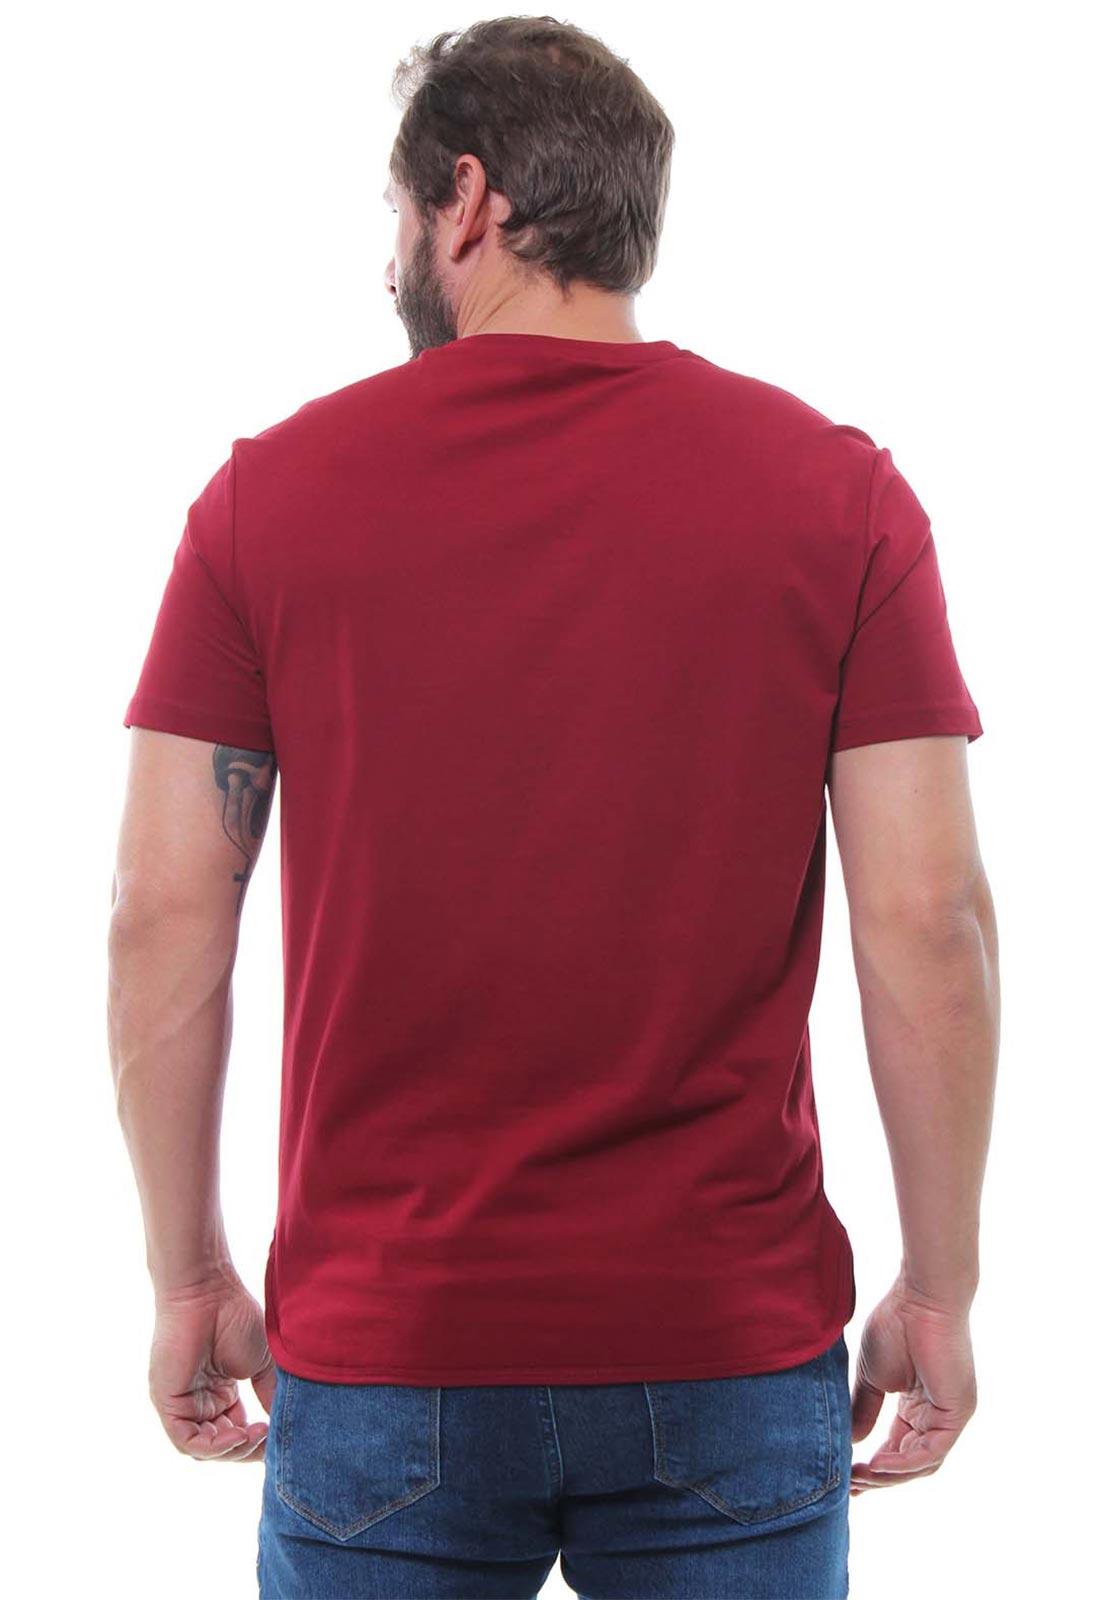 Camiseta Masculina Manga Curta Crocker - 47855  - CROCKER JEANS